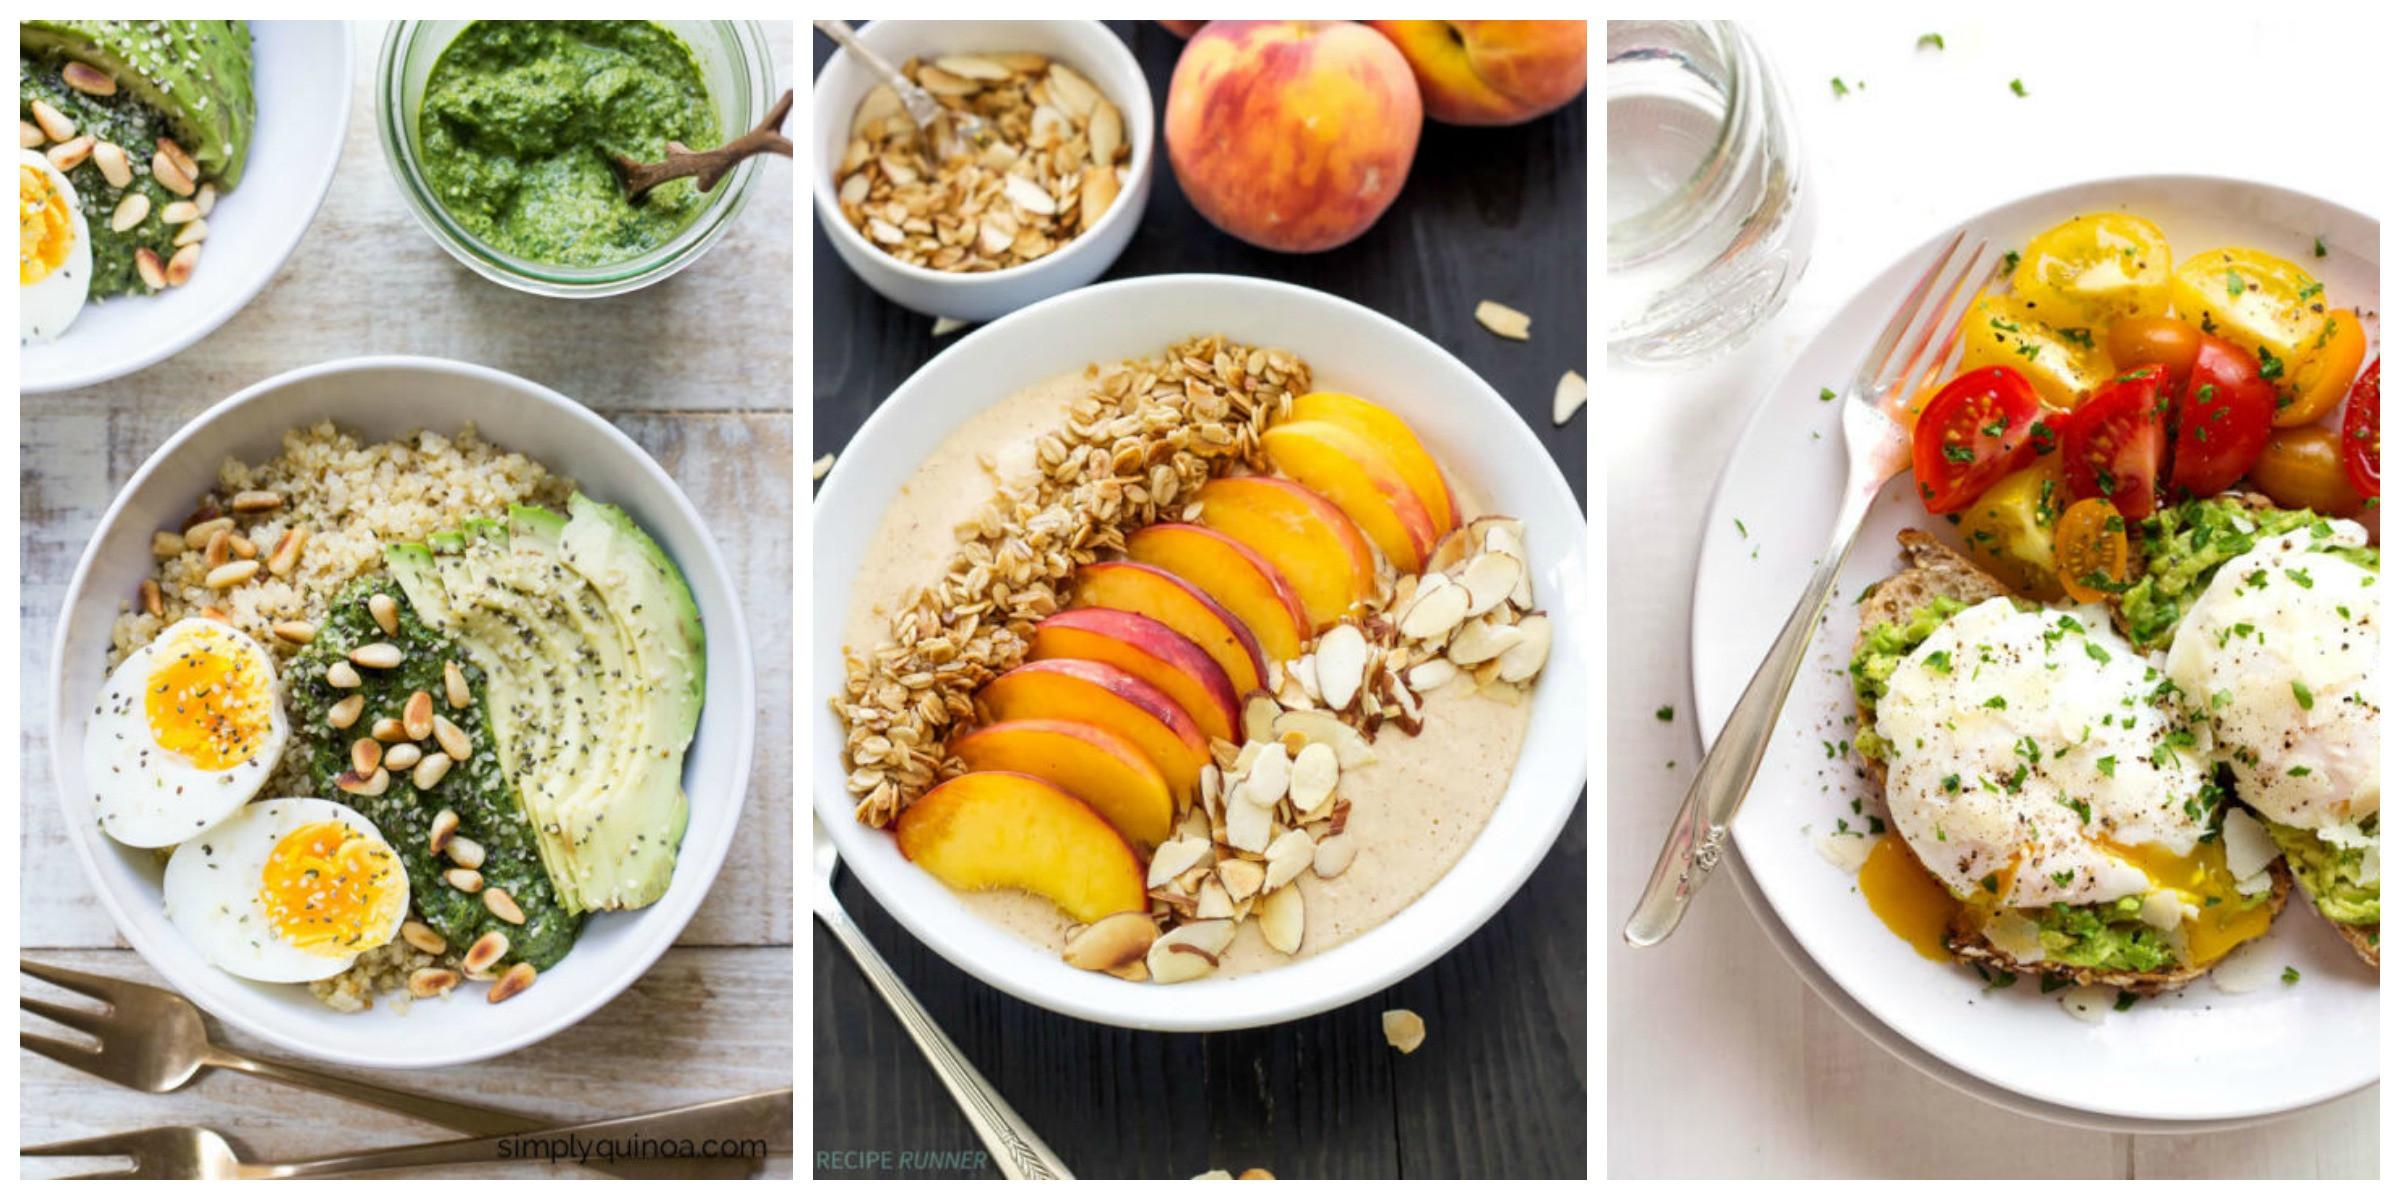 Healthy Nutritious Breakfast  20 Best Healthy Breakfast Food Ideas Recipes for Healthy